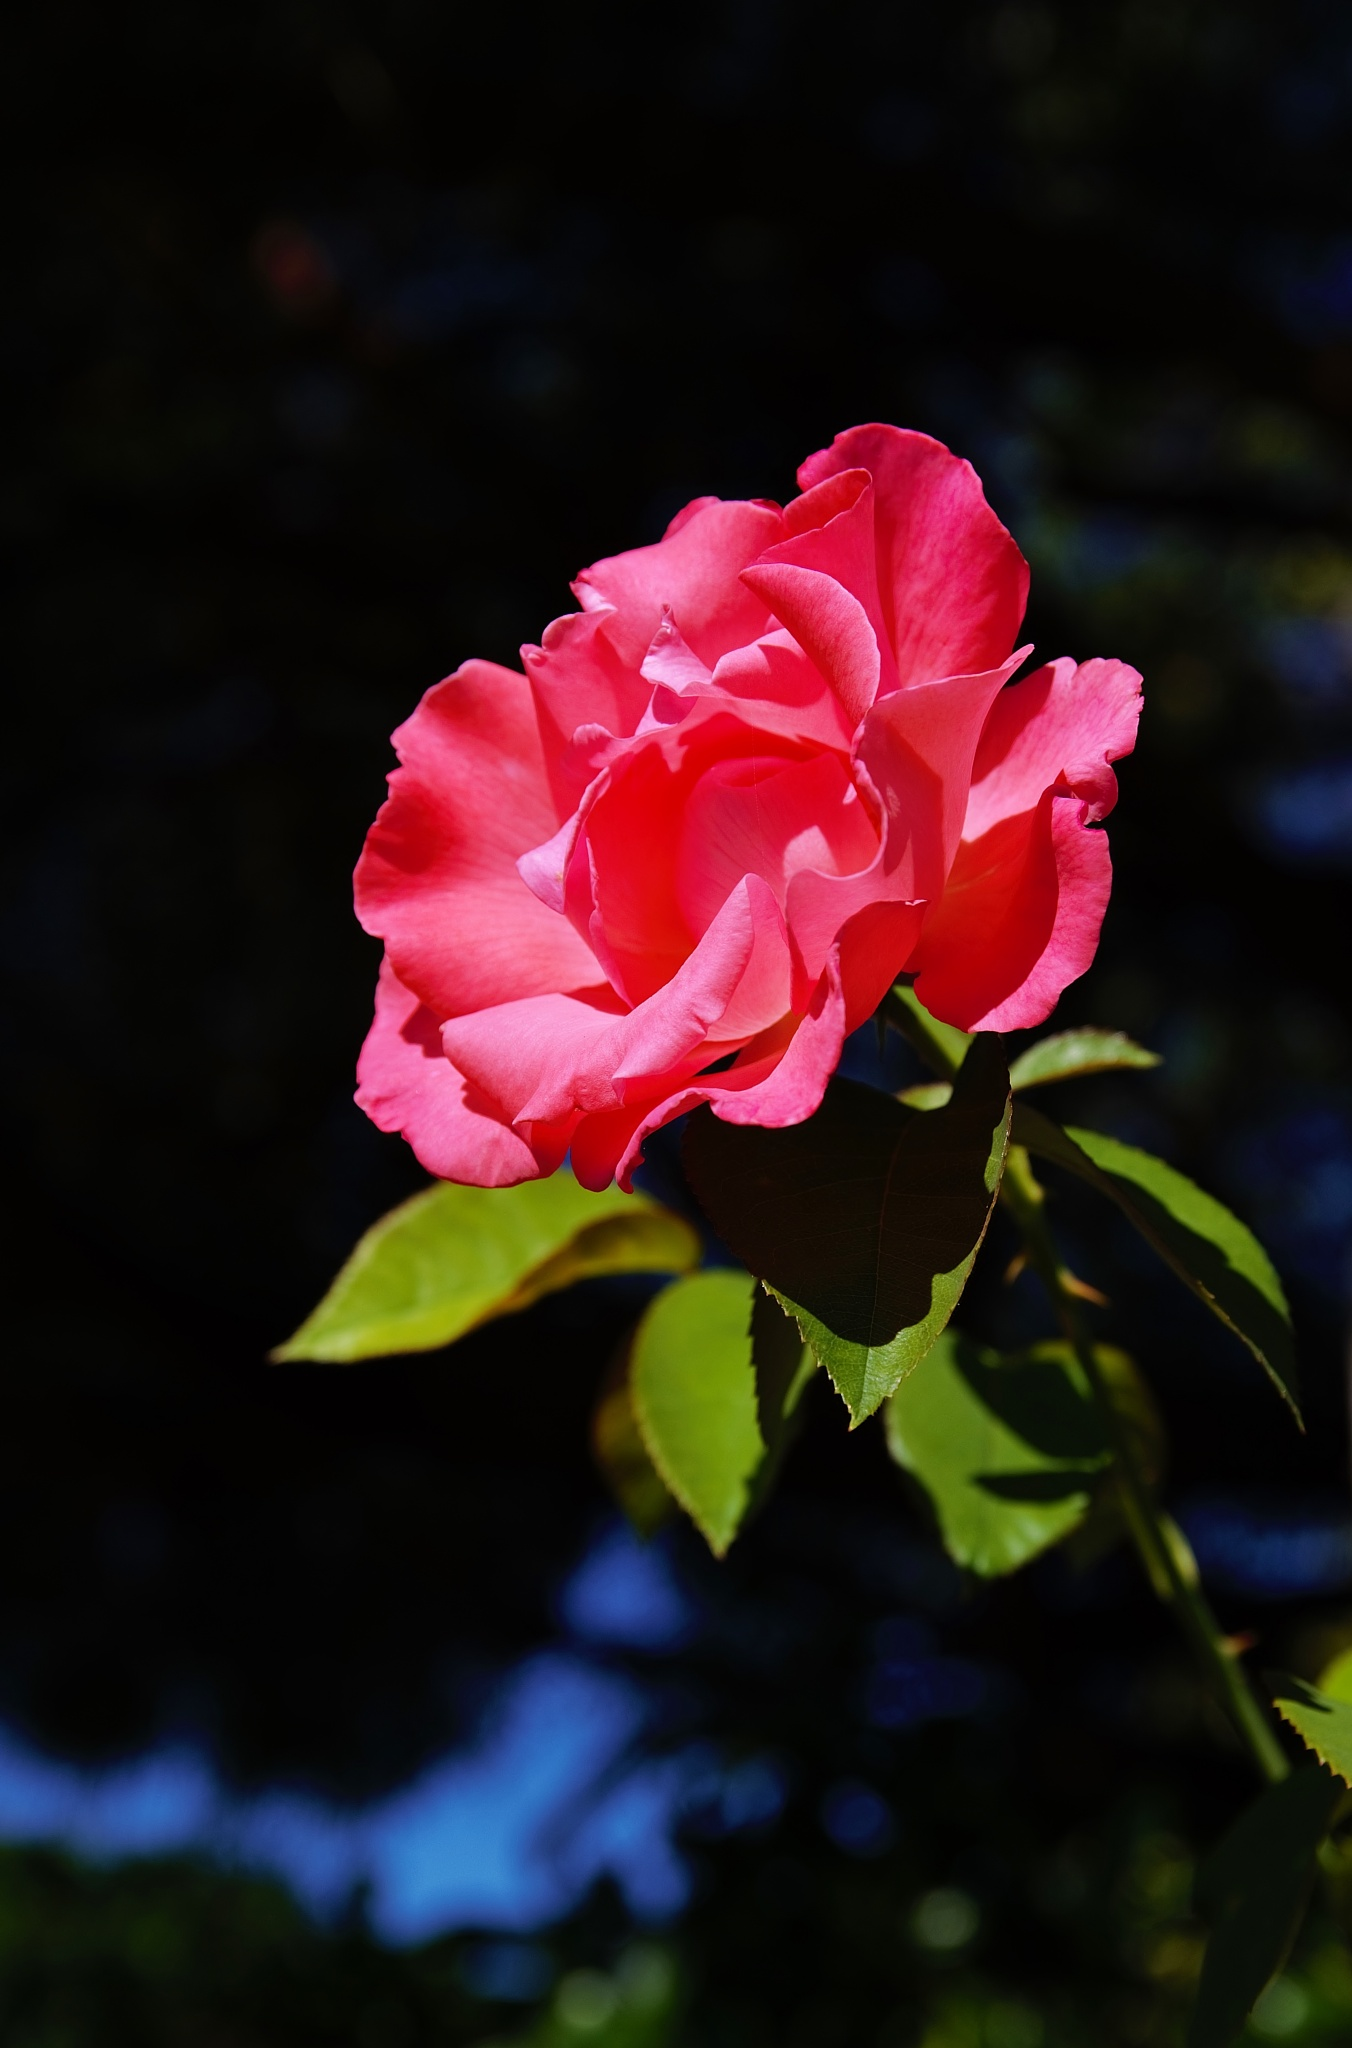 Pink Rose Next Door by David Amaral